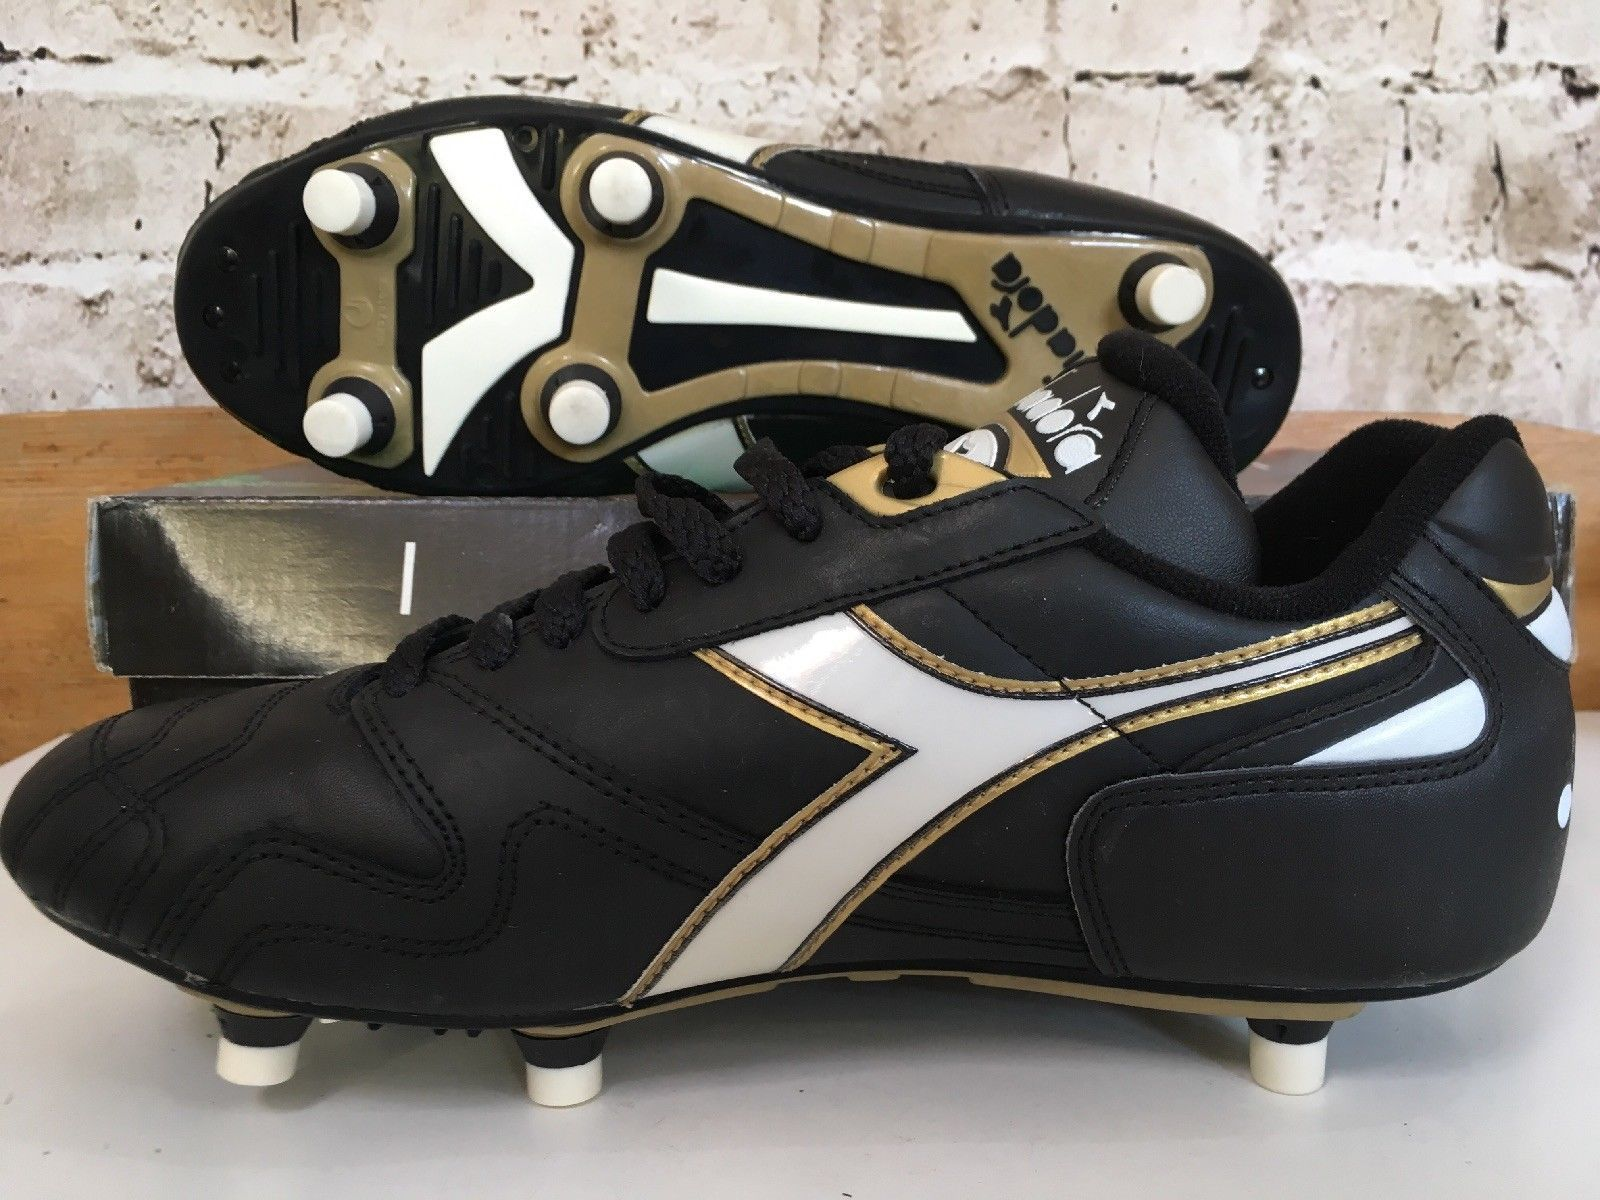 Vintage 1990s Diadora Squadra Sc Uk 8 Us 9 Eu 42 Football Boots Black Leather Og Ebay Chuteiras Adidas Chuteiras Adidas